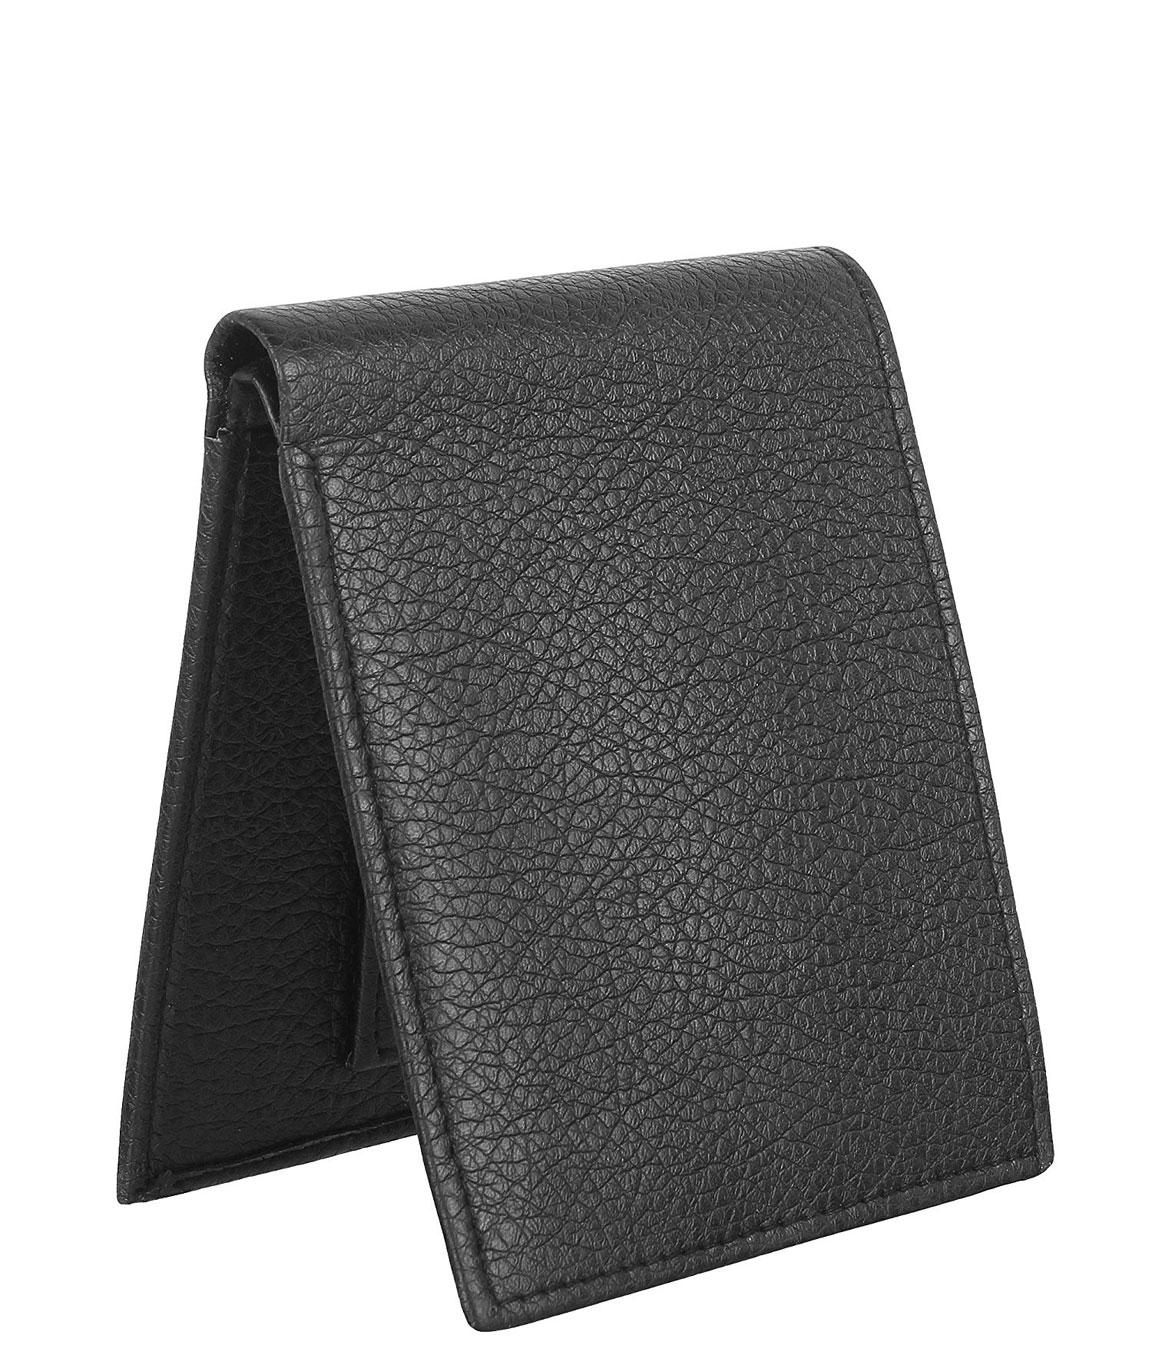 ZORO Black PU Leather Men`s Wallet